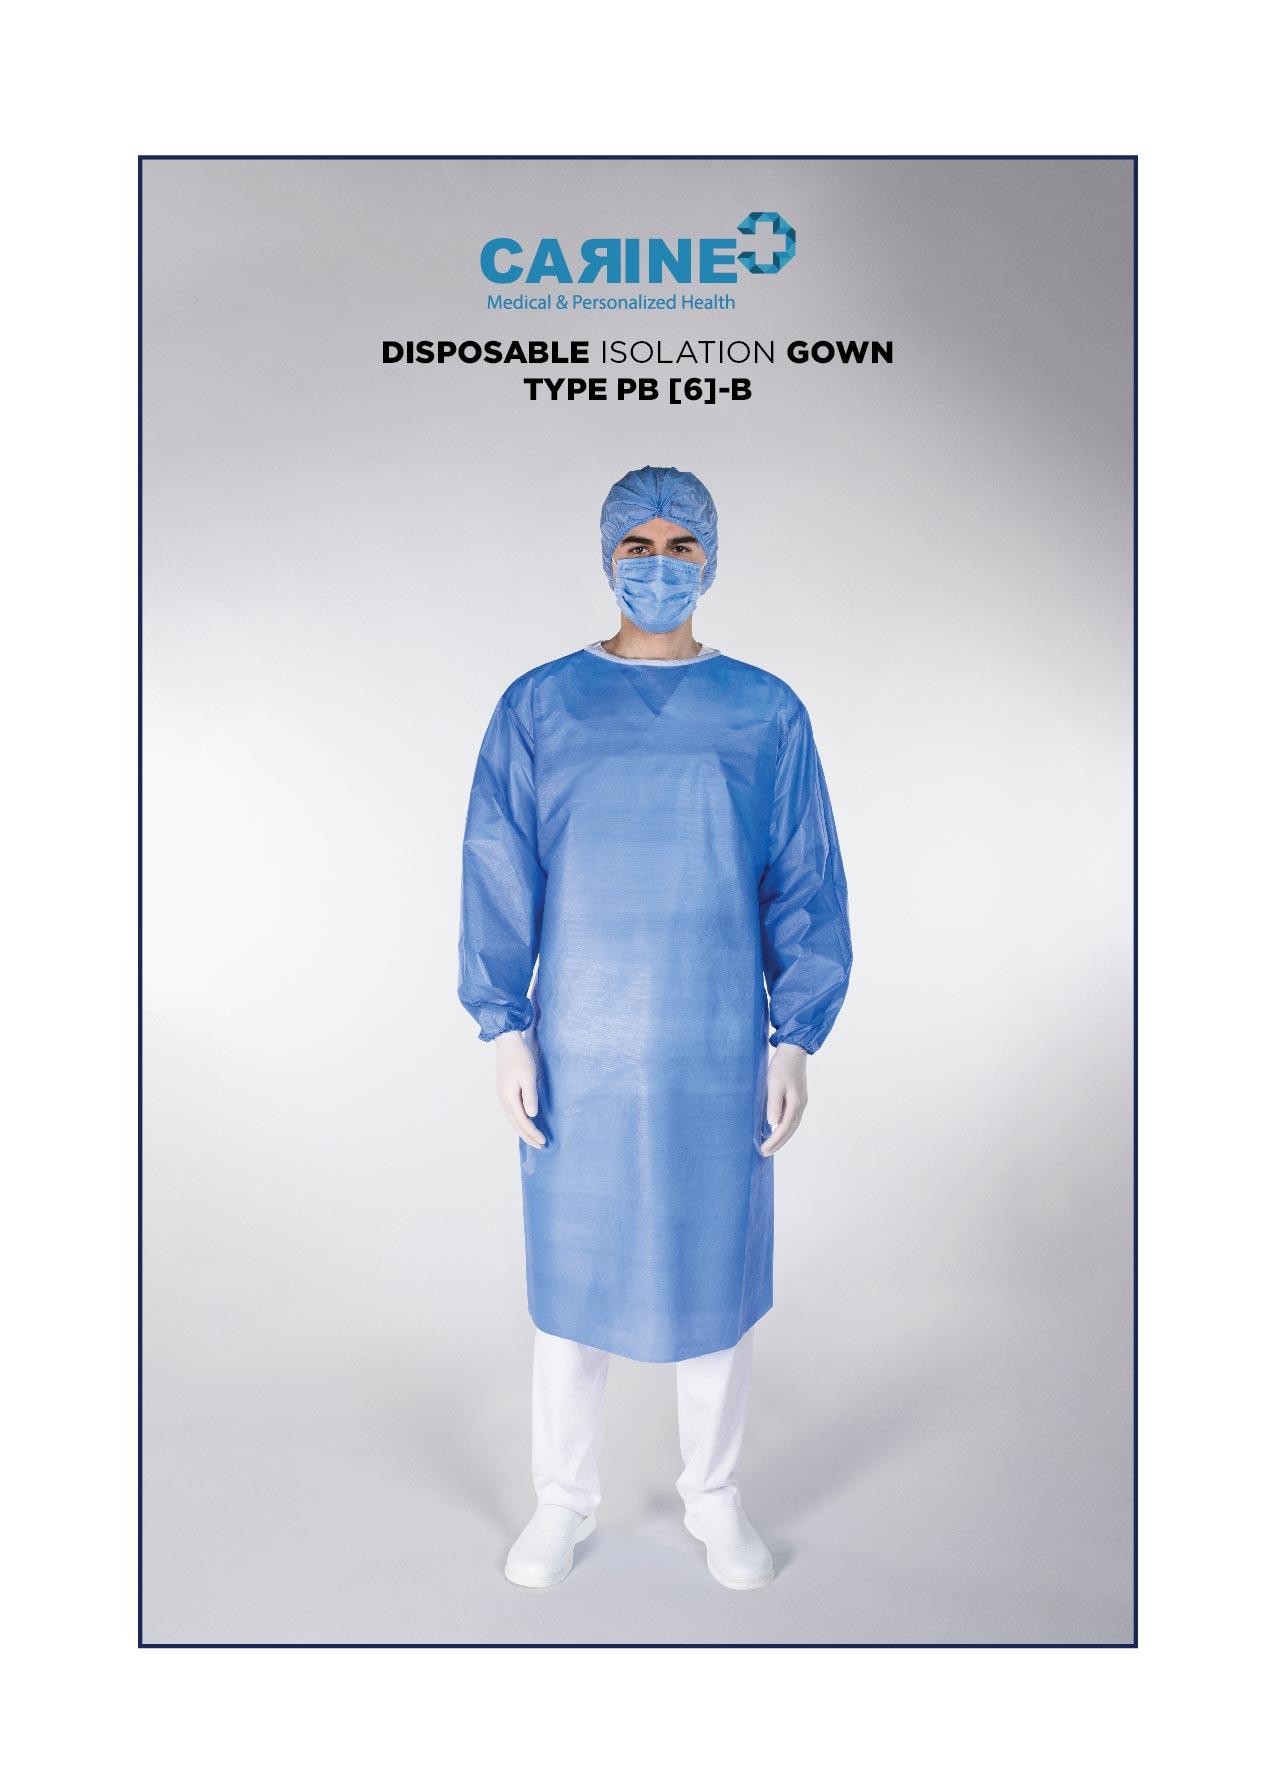 2. CARINE MEDICAL COVID-19 LINE-65